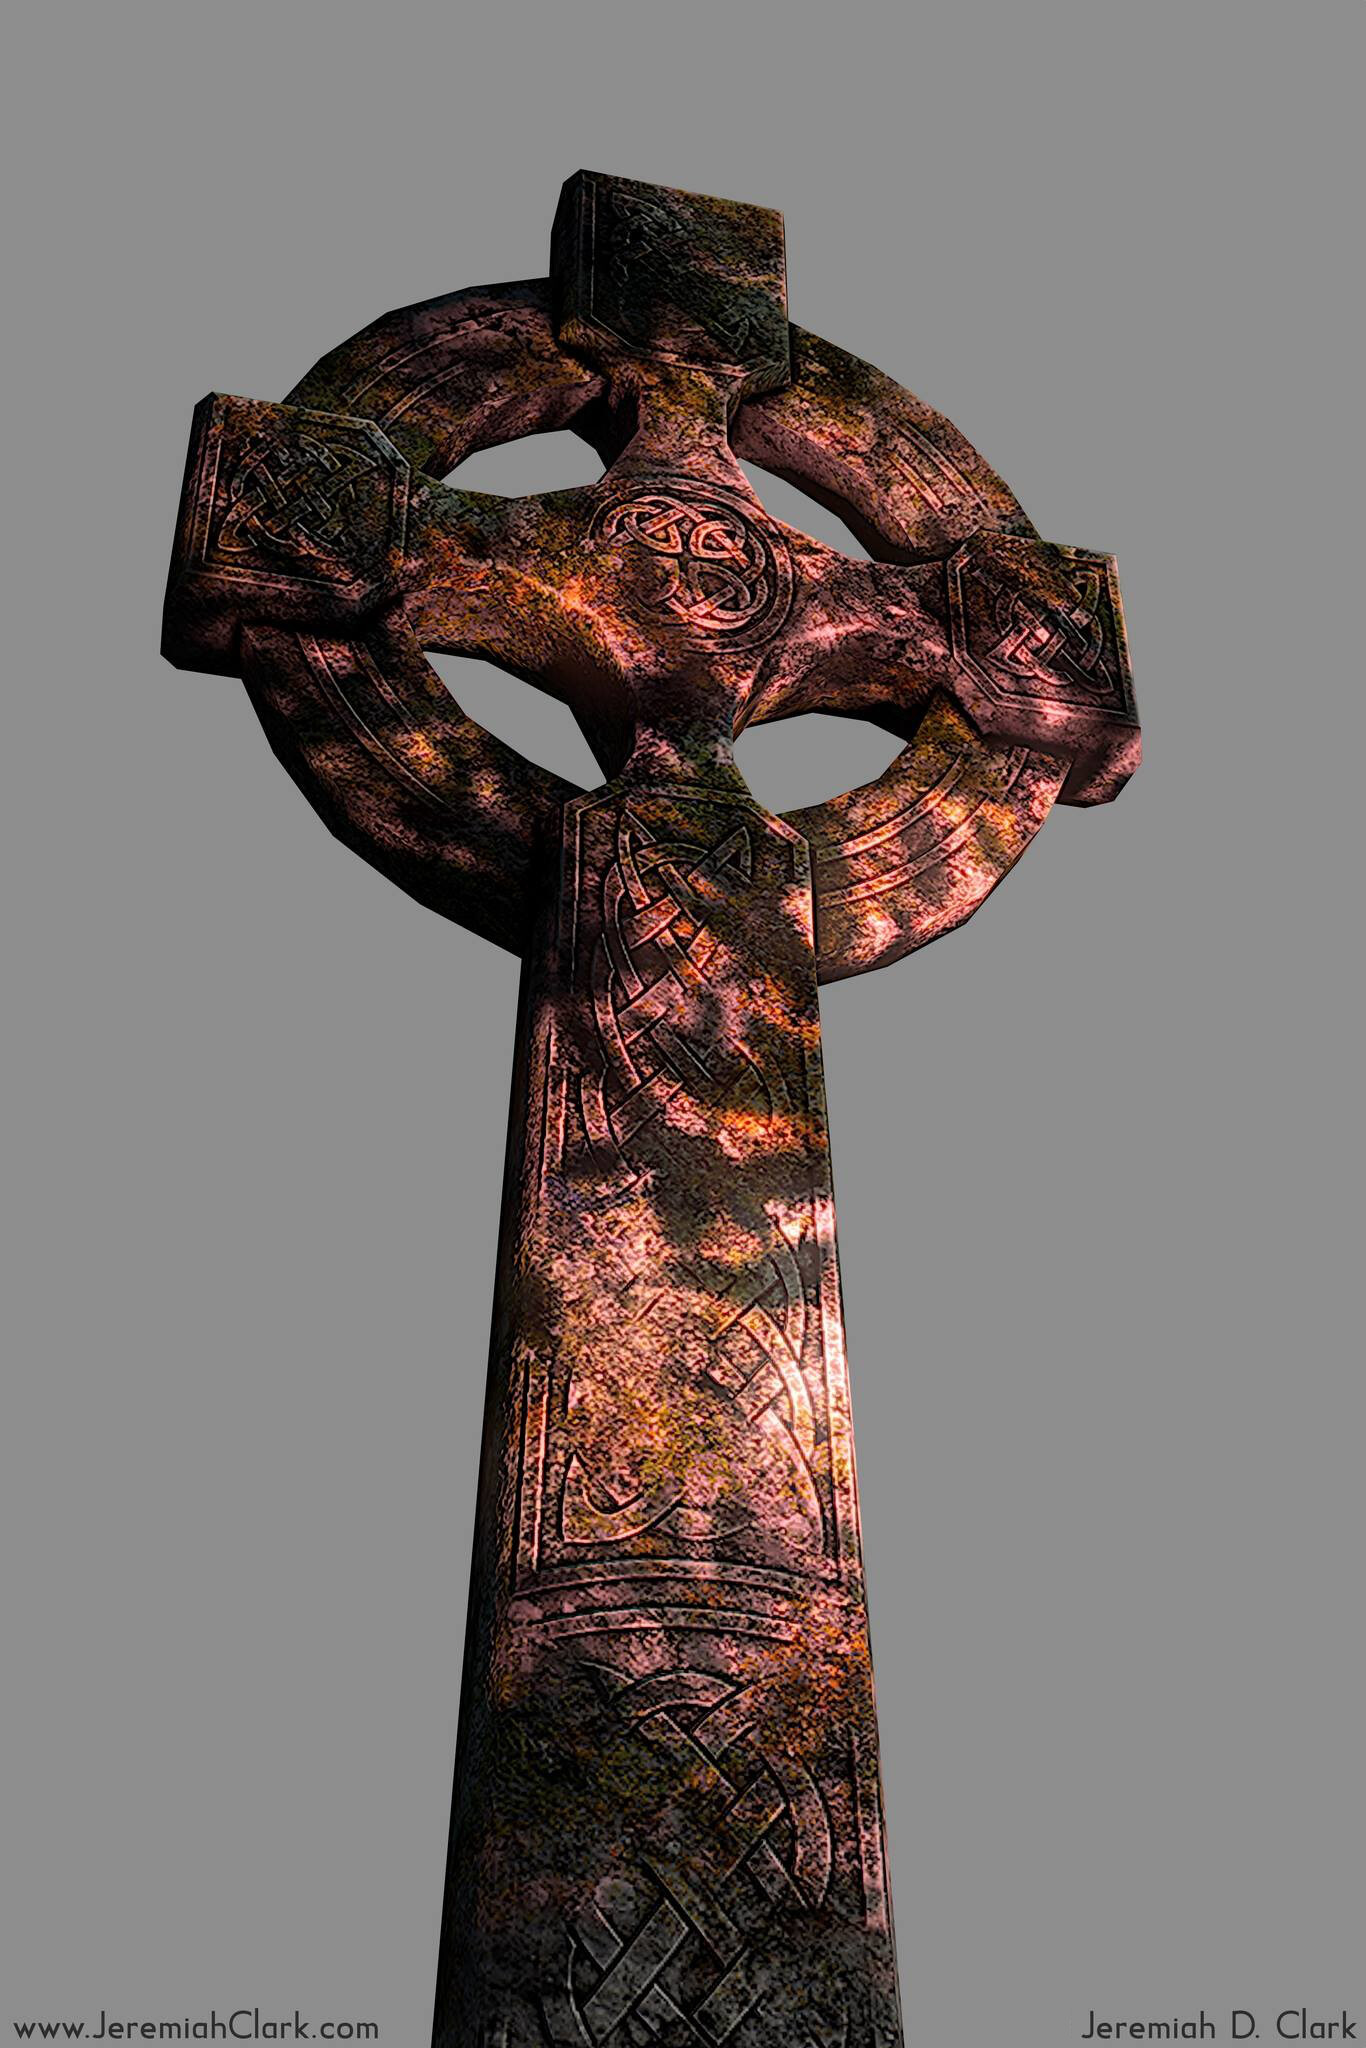 Jeremiah clark celticcross2